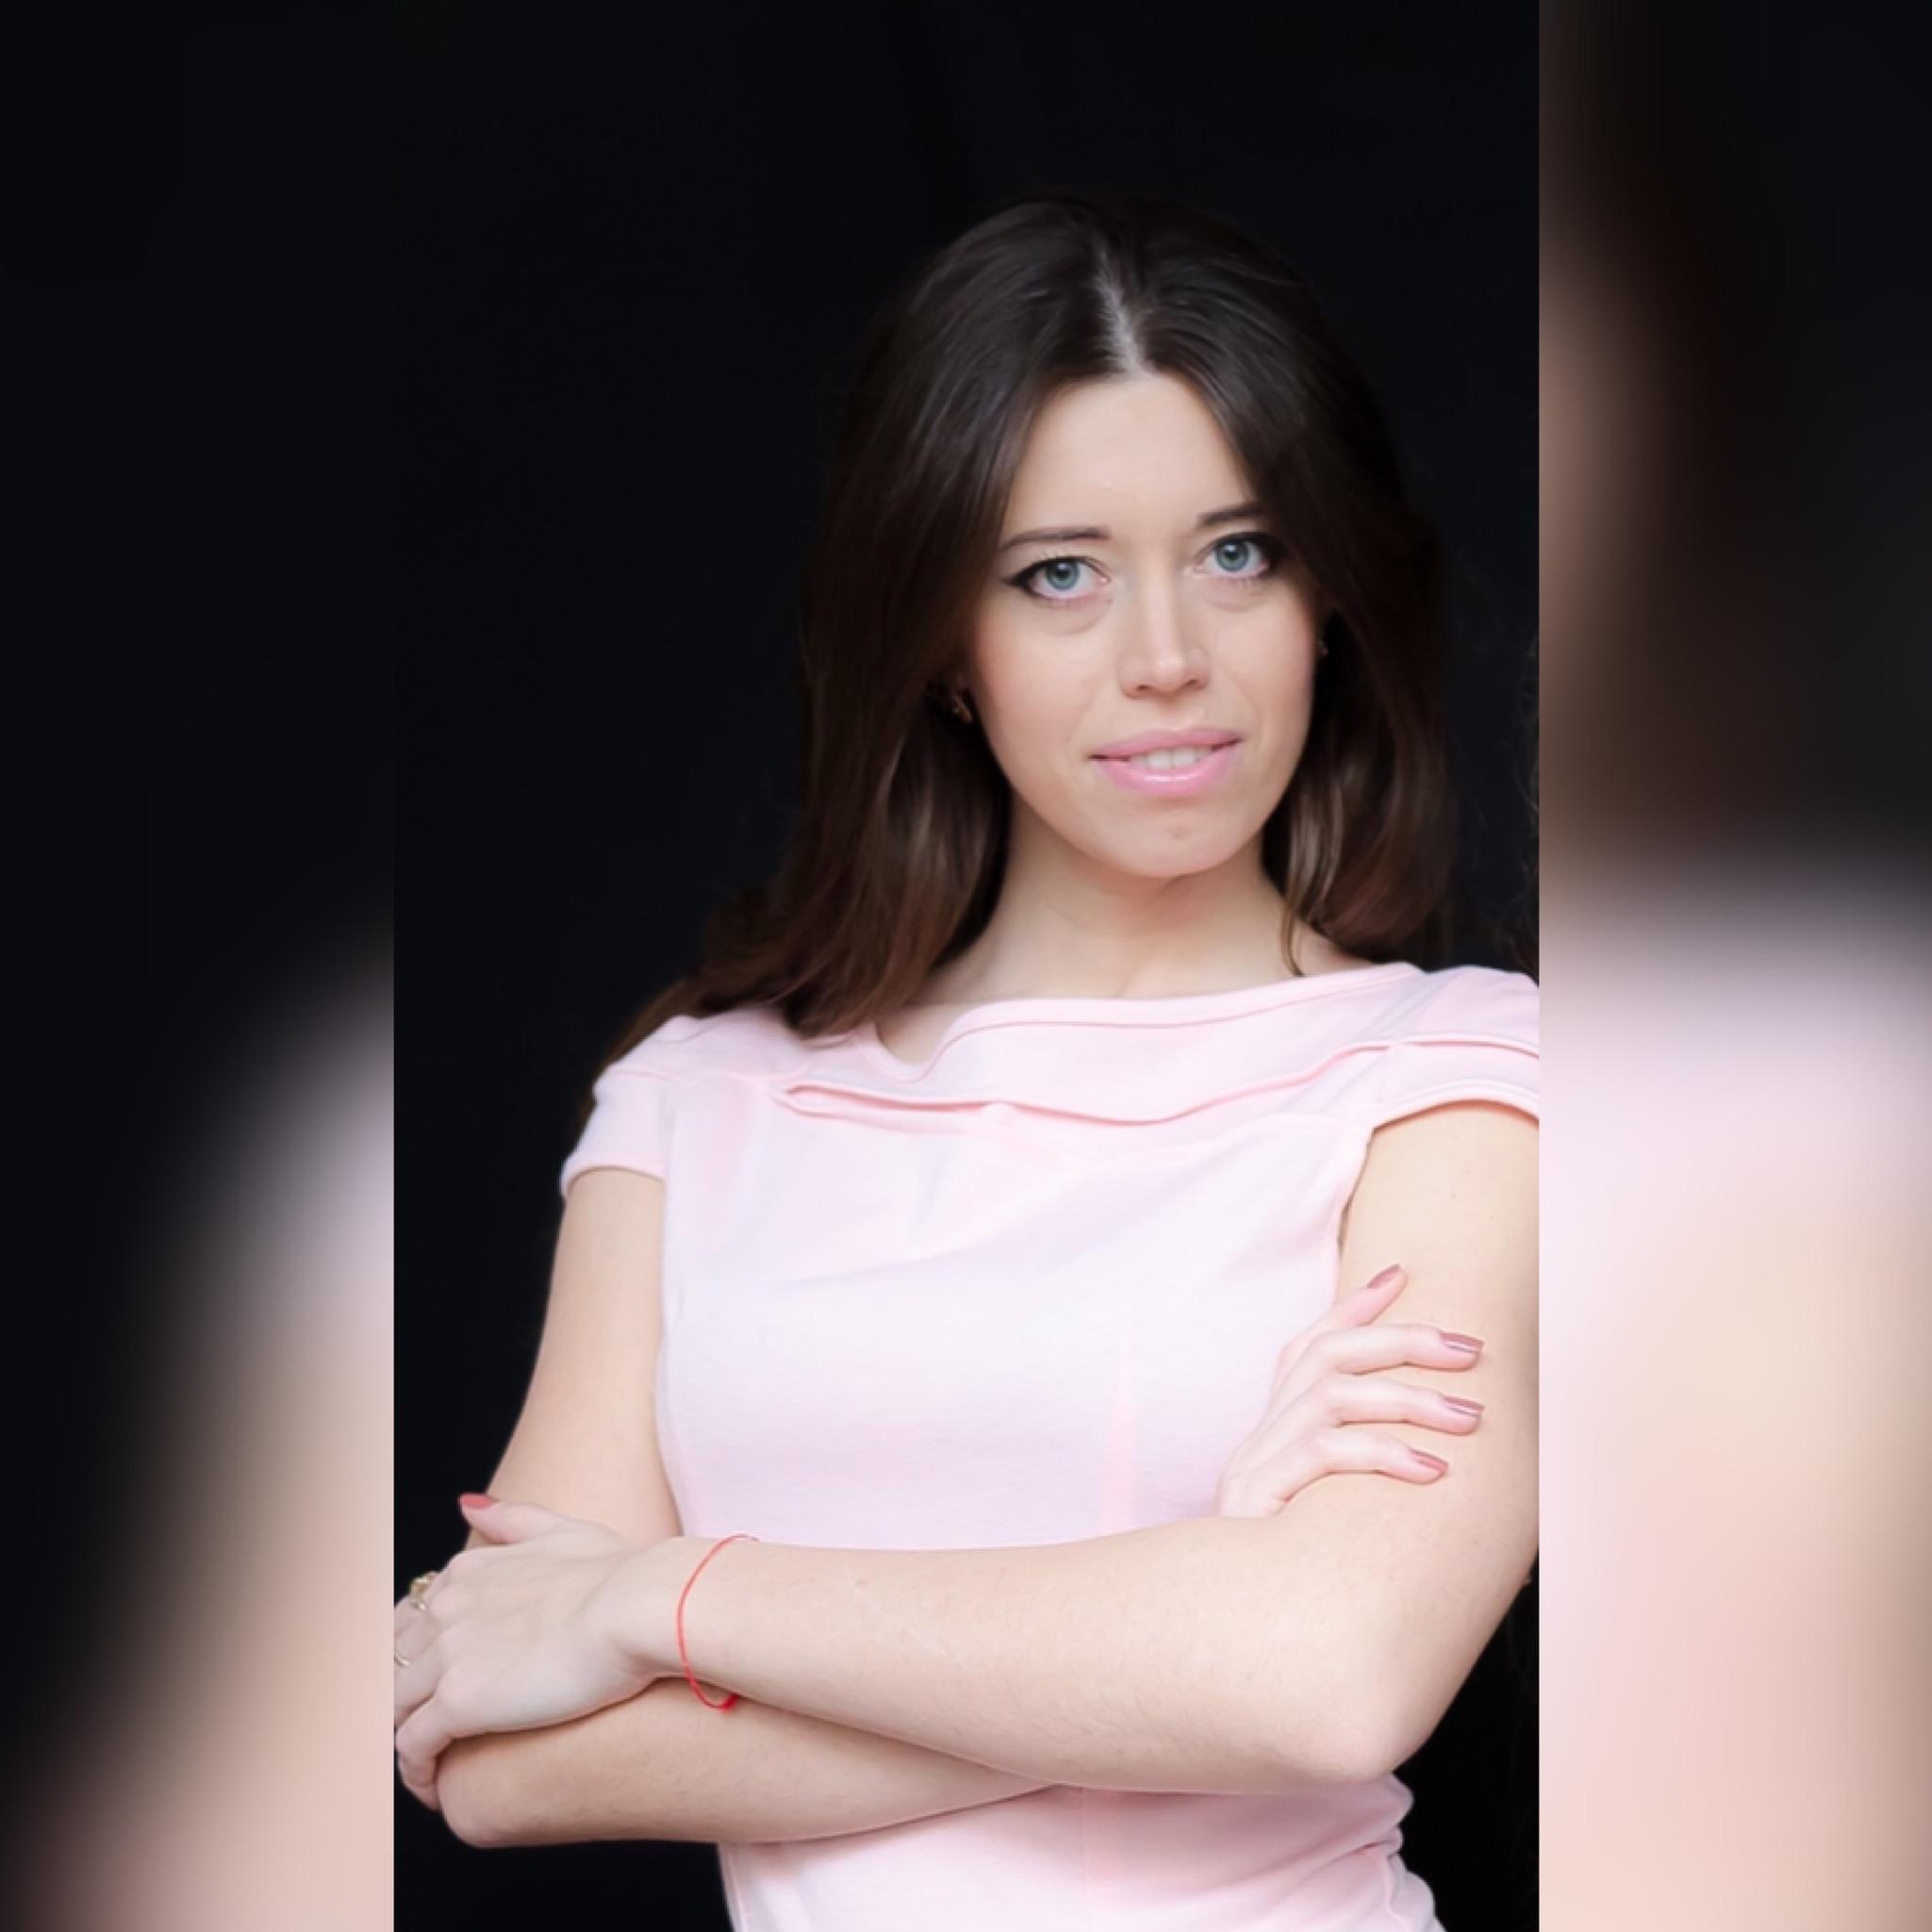 Юлия Ракова в Ростове-на-Дону